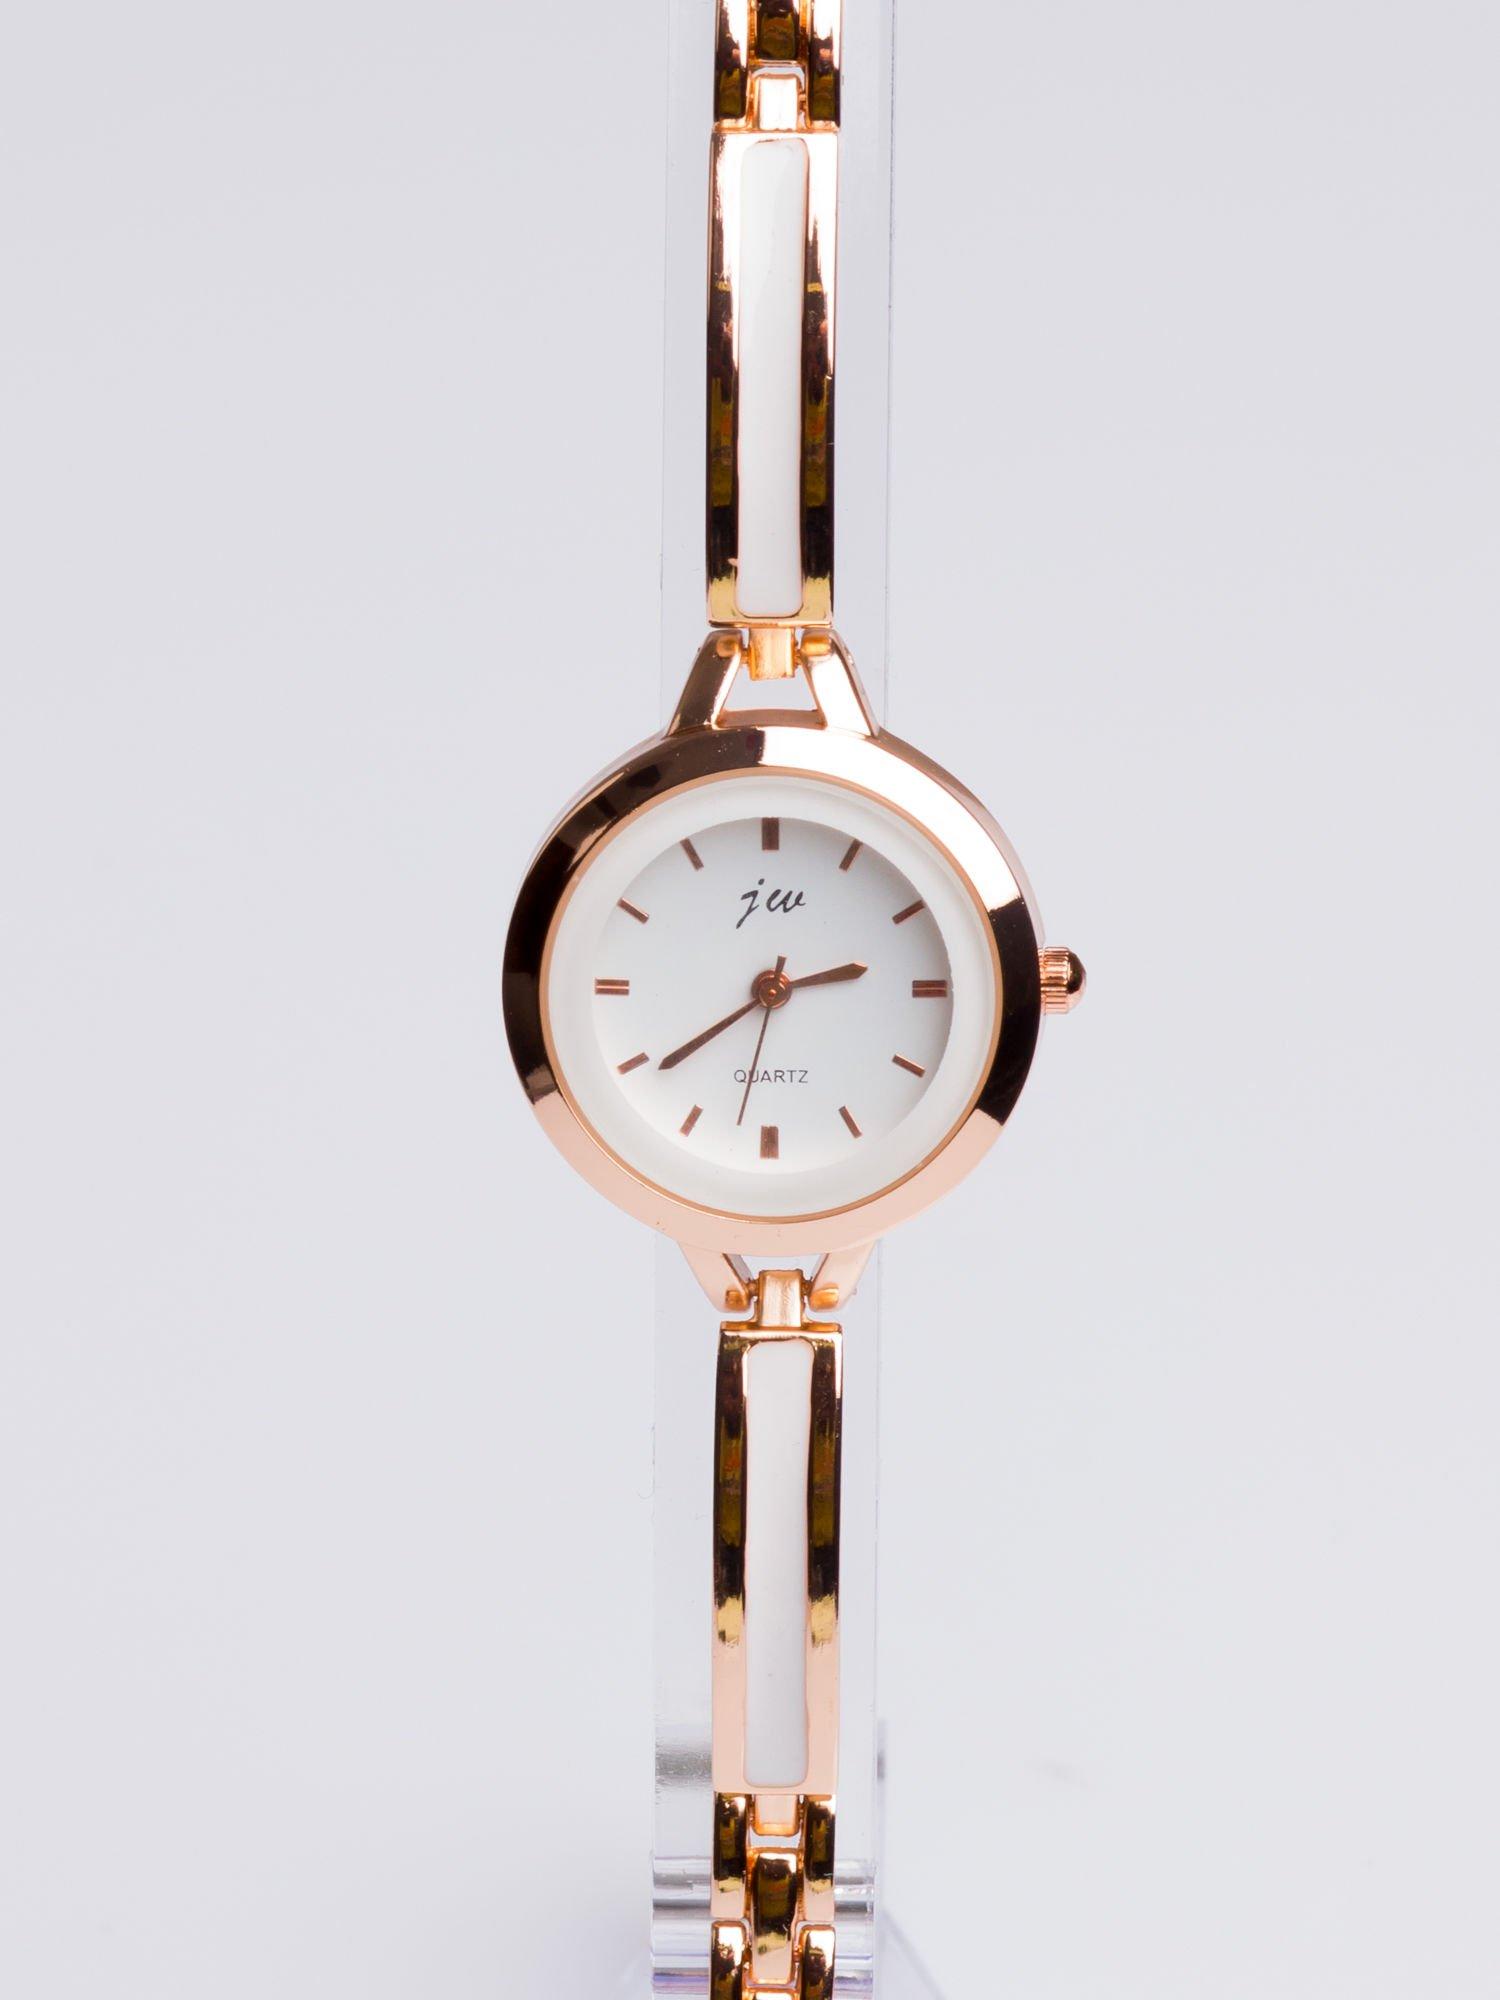 Złoty elegancki i delikatny zegarek damski                                  zdj.                                  3